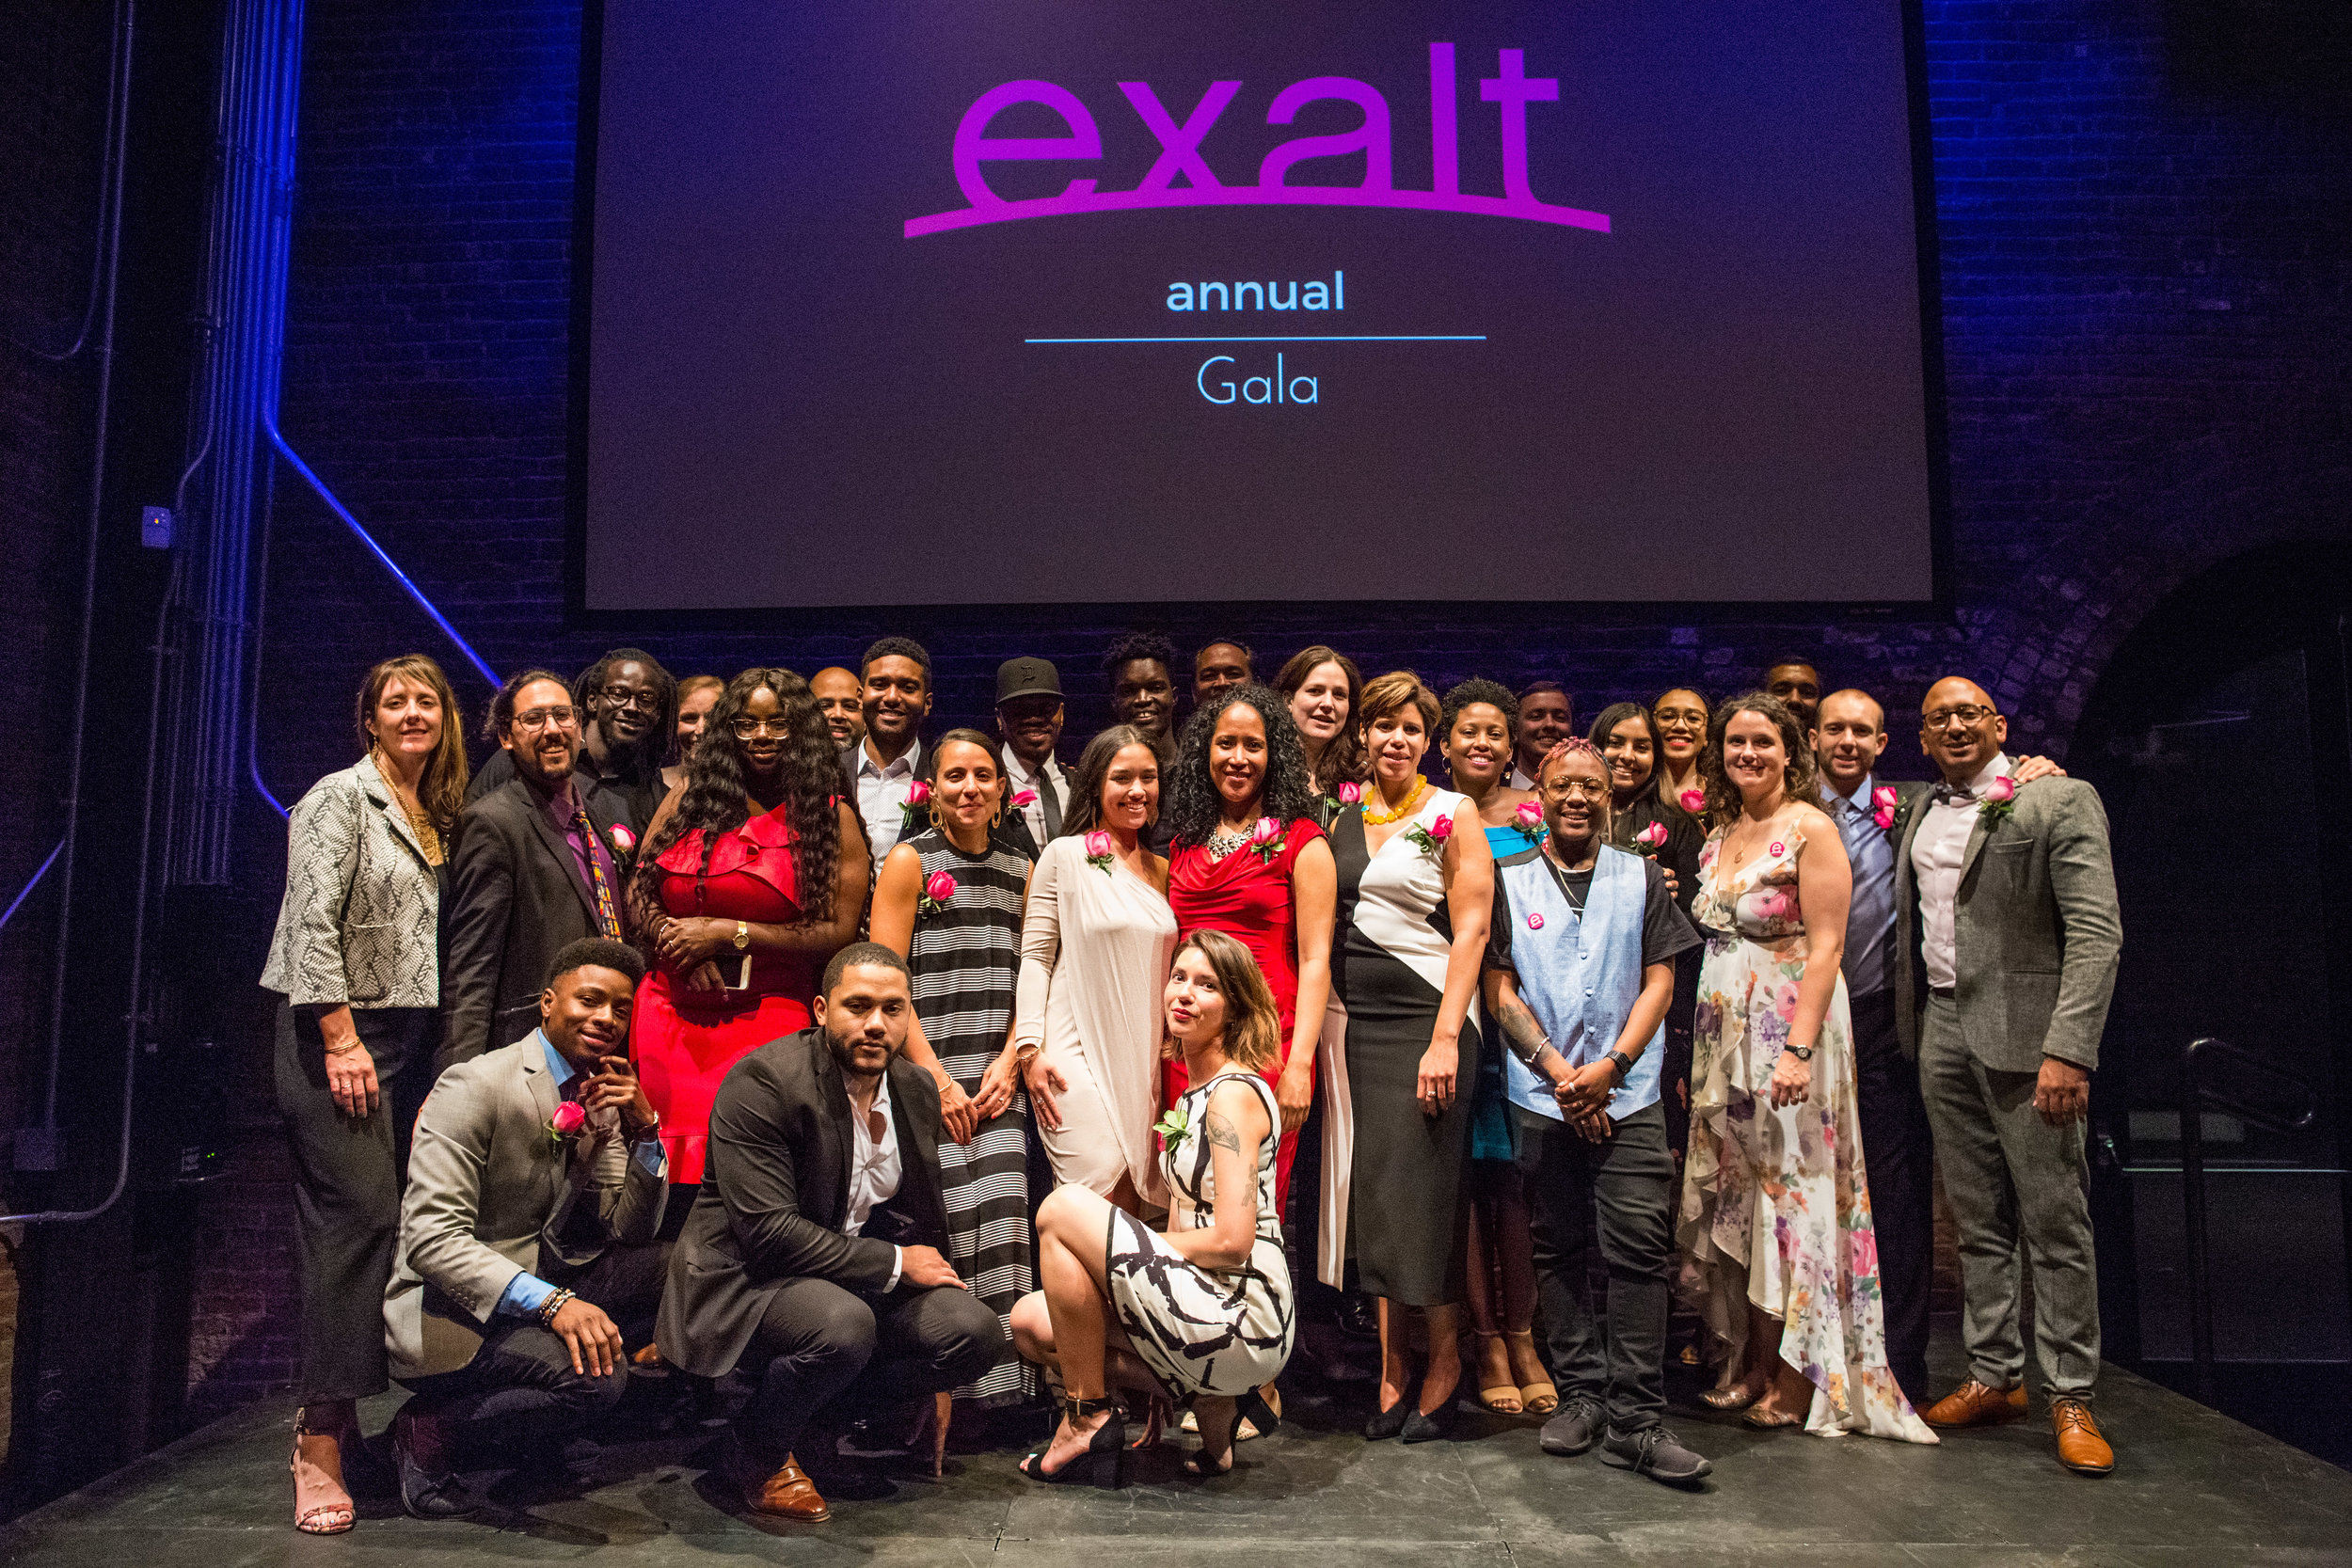 20180614-Exalt Gala-1018.jpg